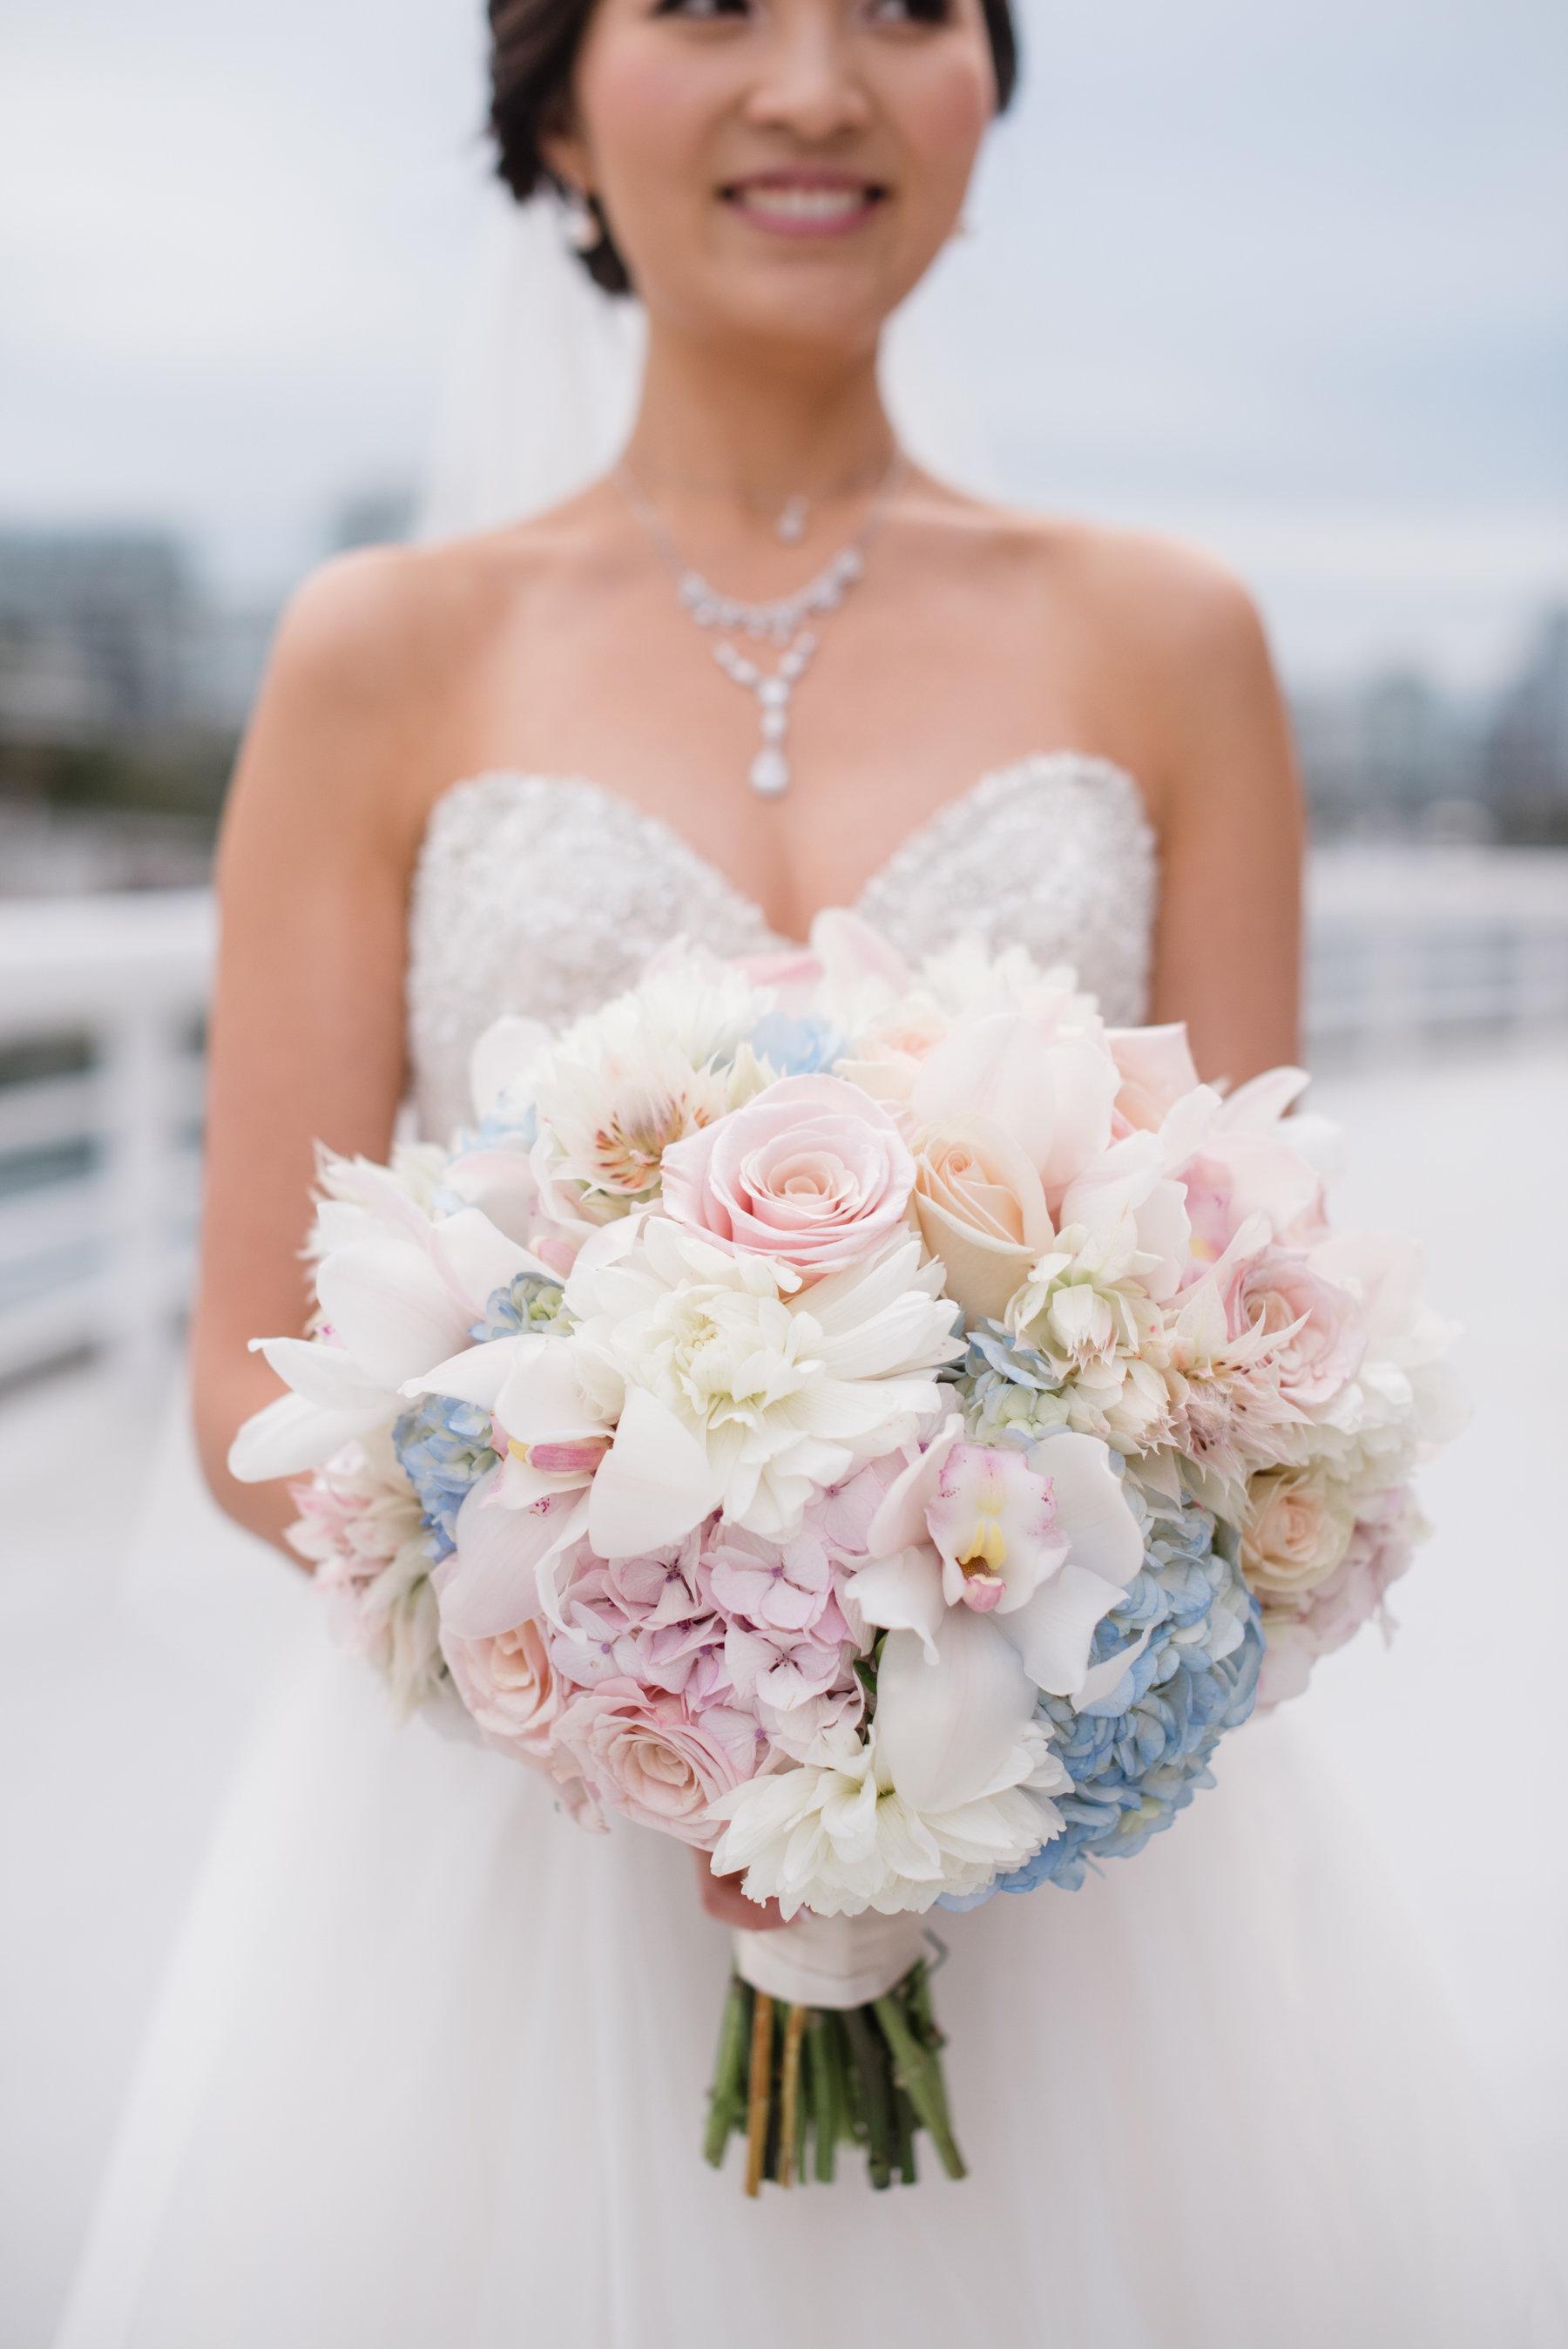 Designer: Flowerz |Photography: Blush Photography